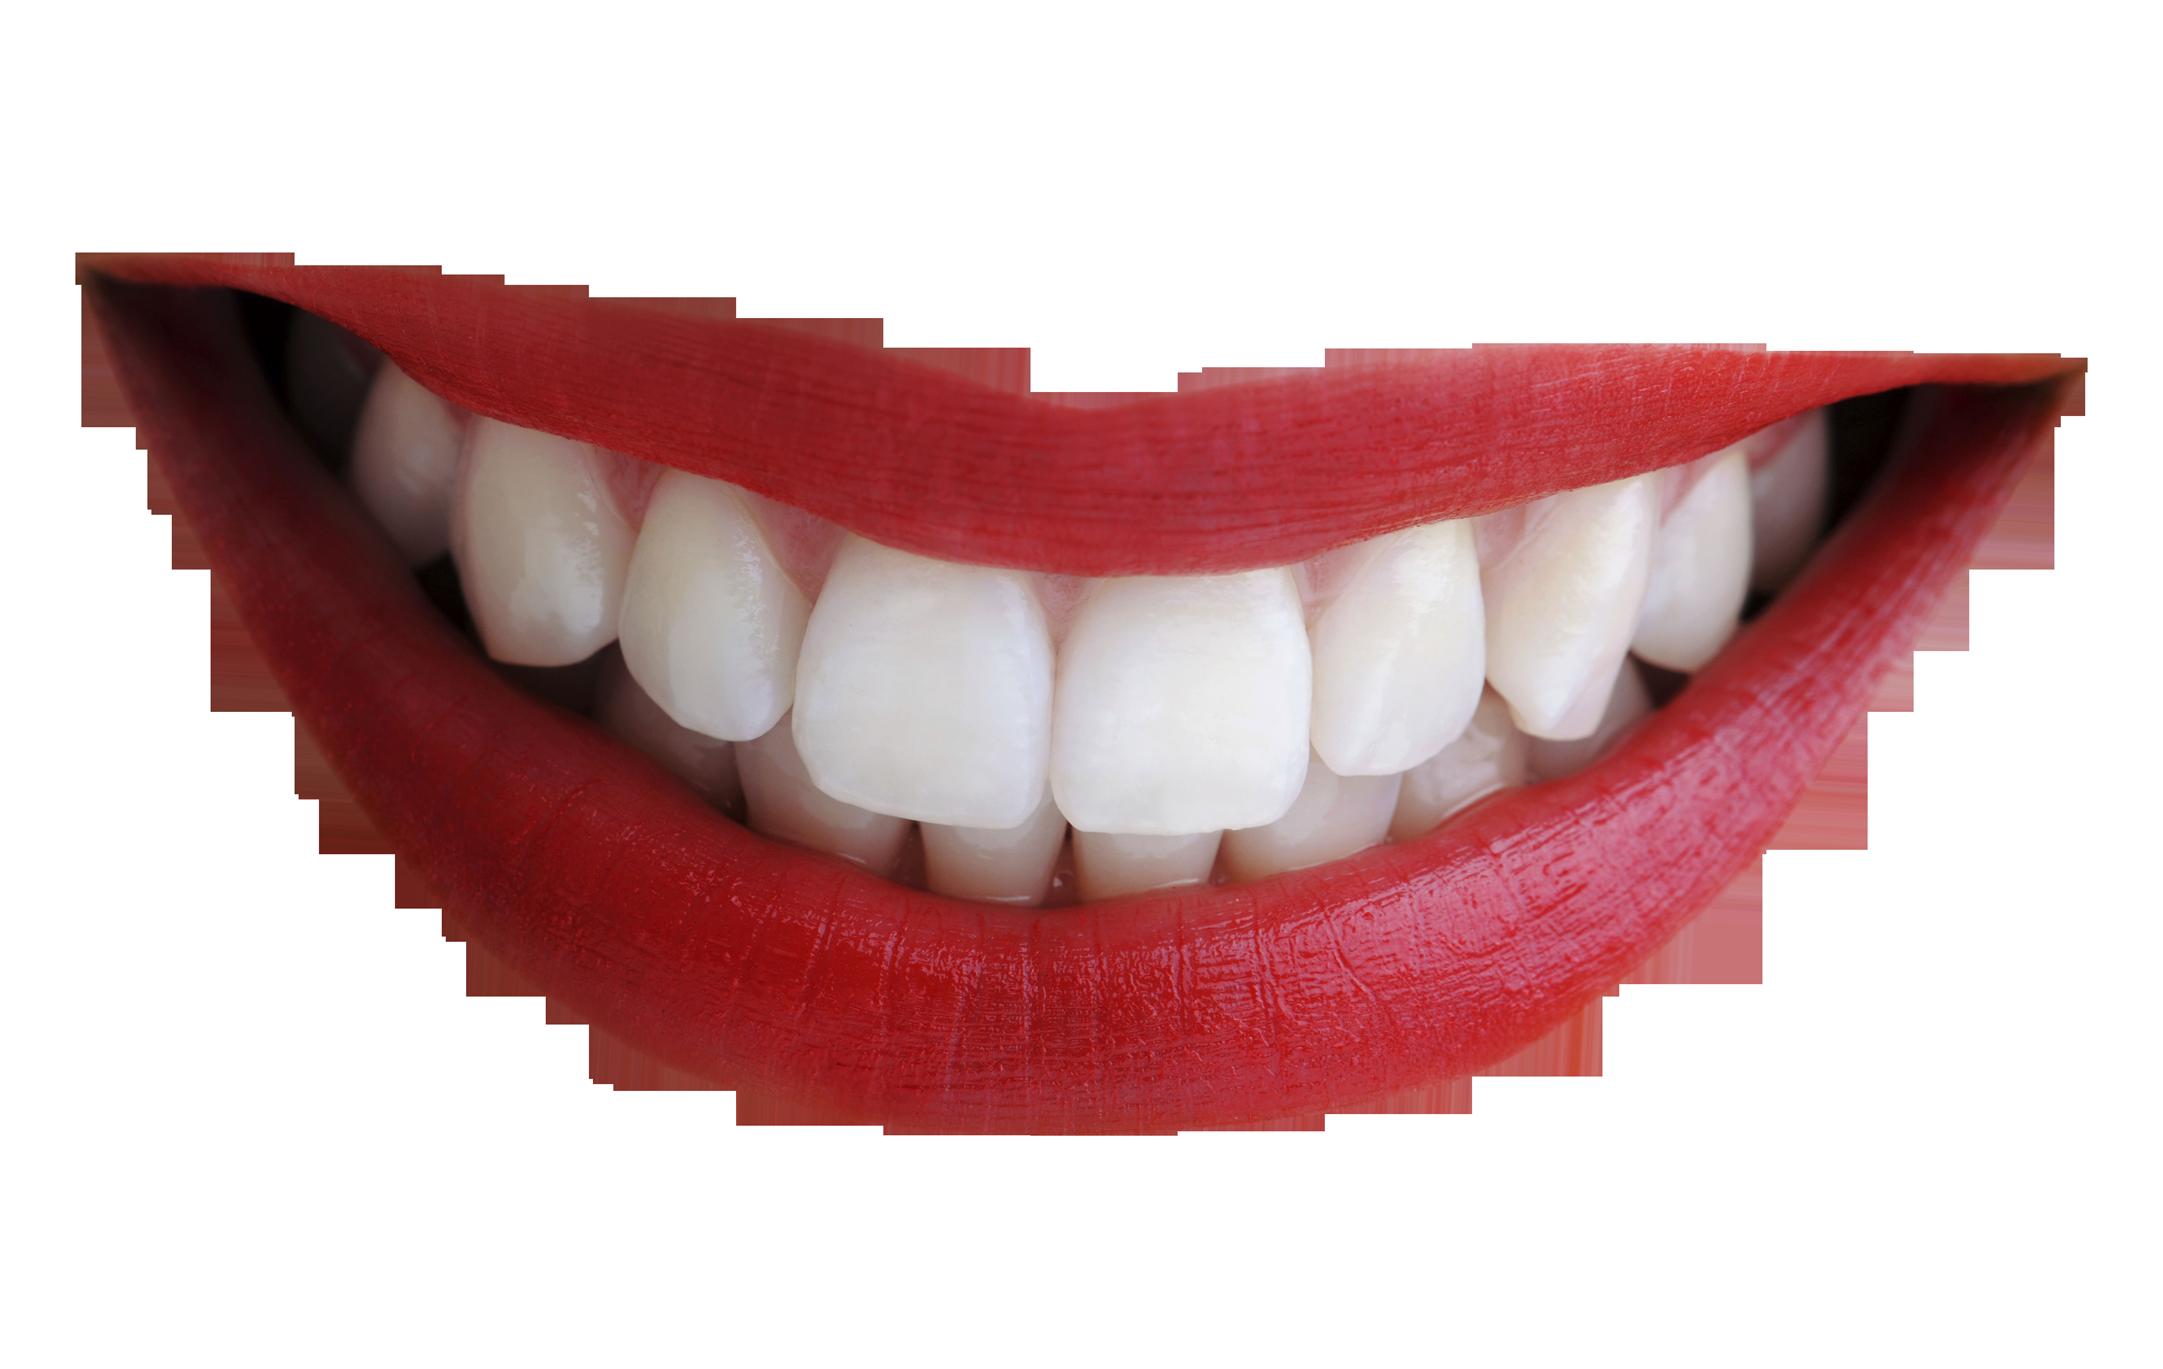 Teeth PNG Transparent Image.